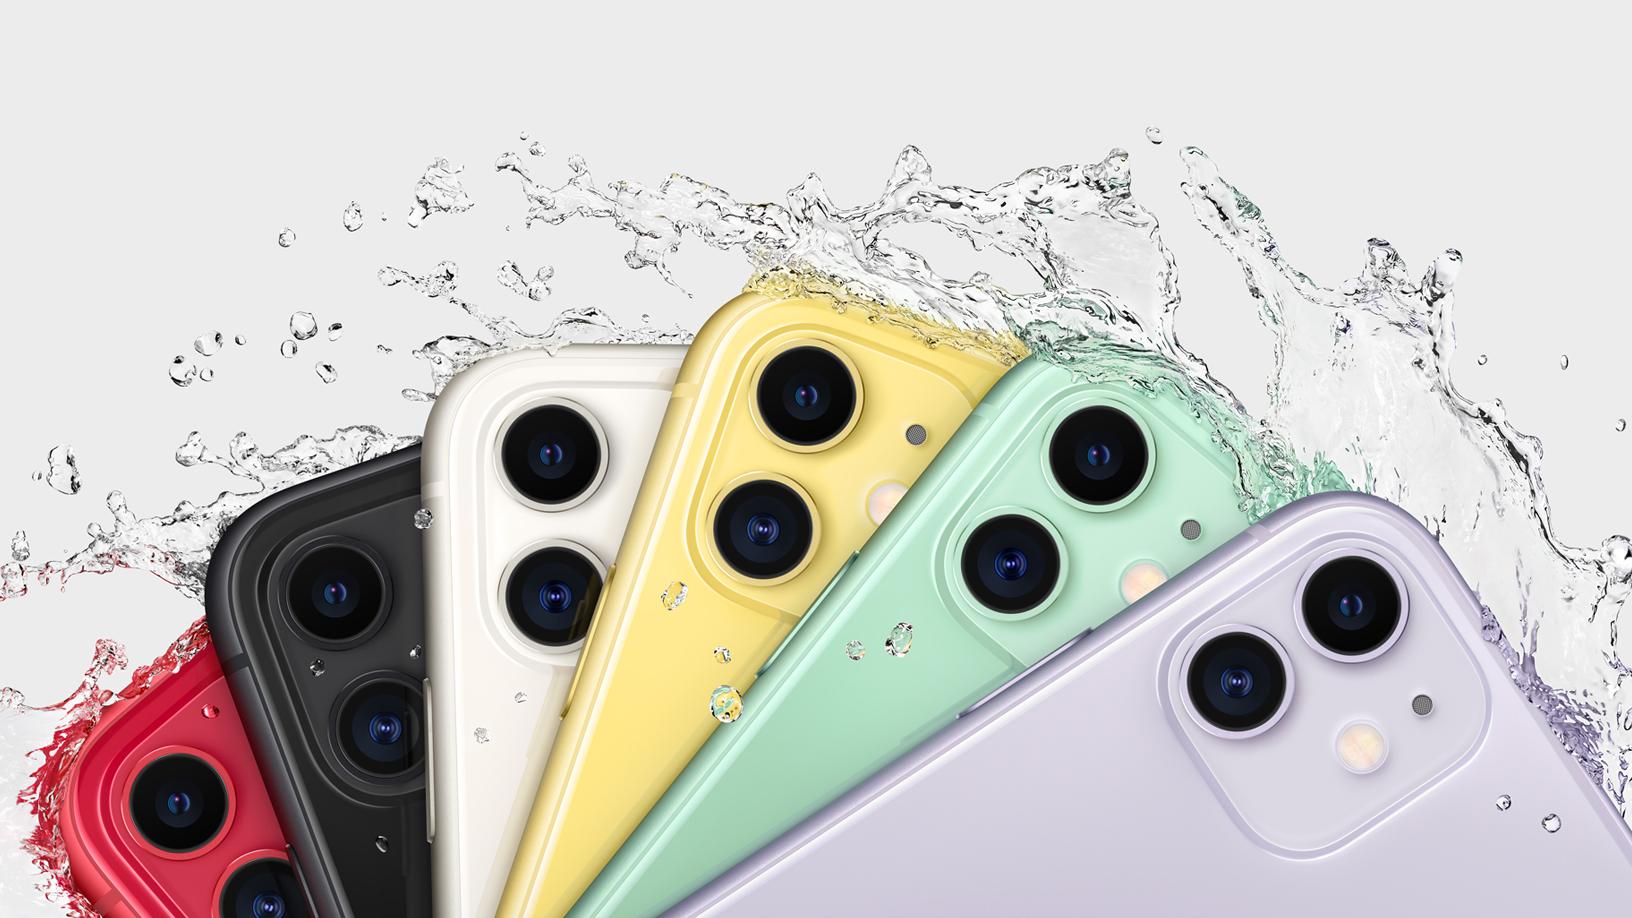 iPhone-Konzern: Coronavirus kippt Apples Umsatzprognose